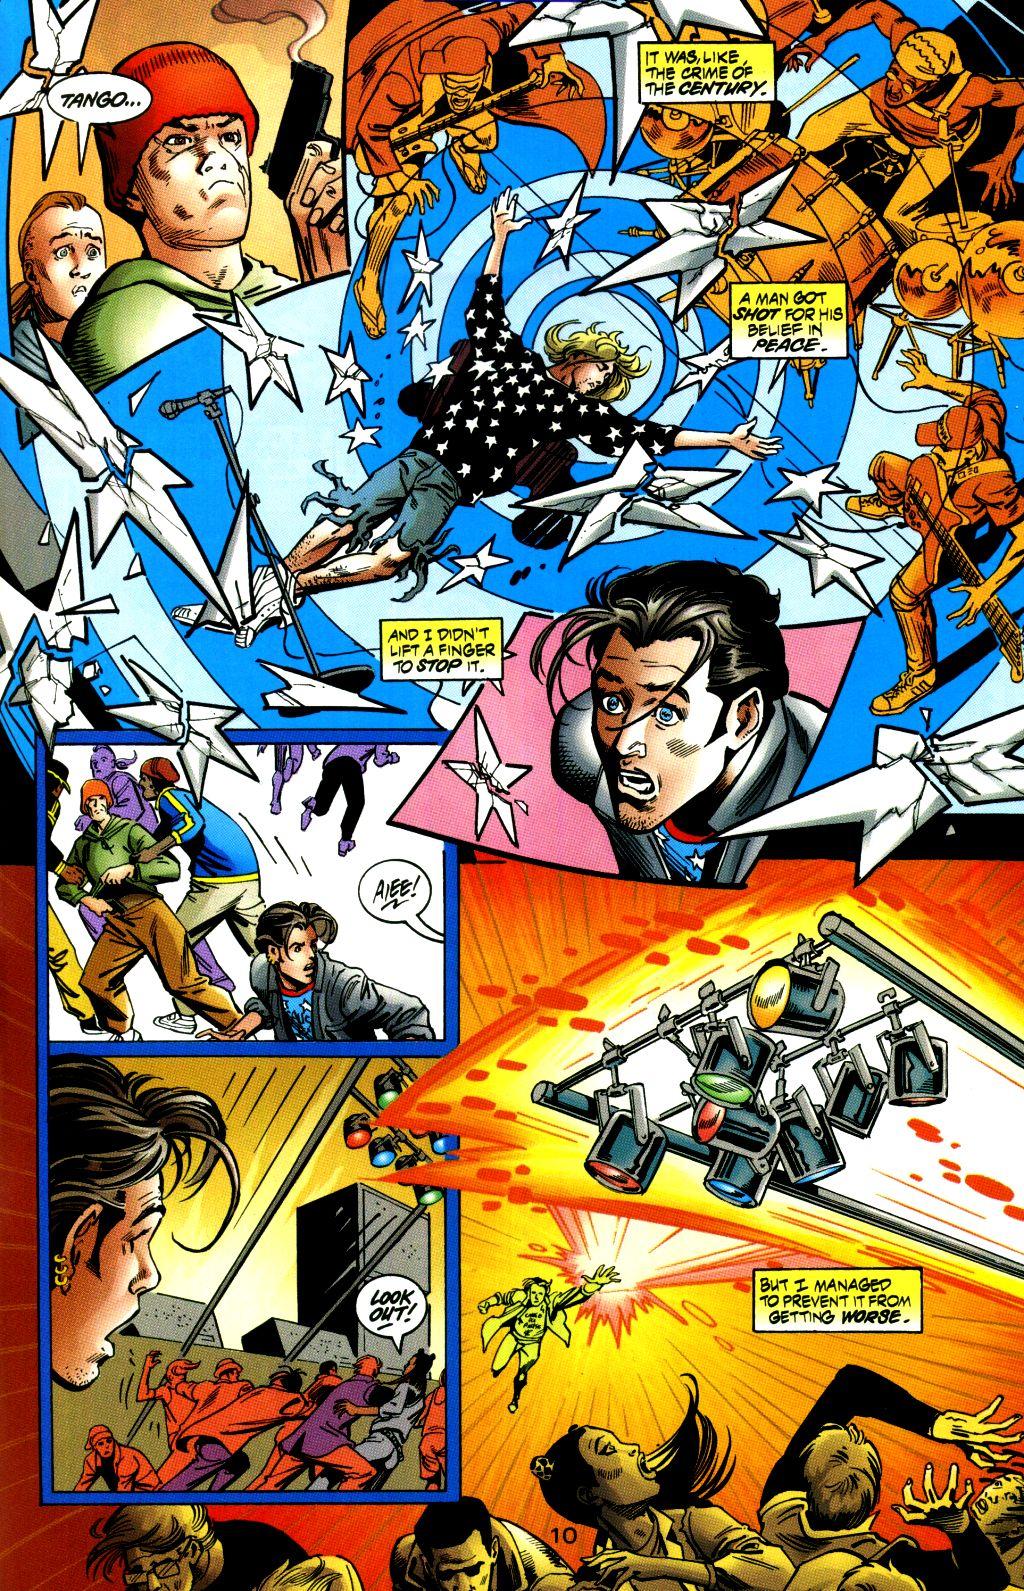 Read online Supermen of America comic -  Issue # Full - 11